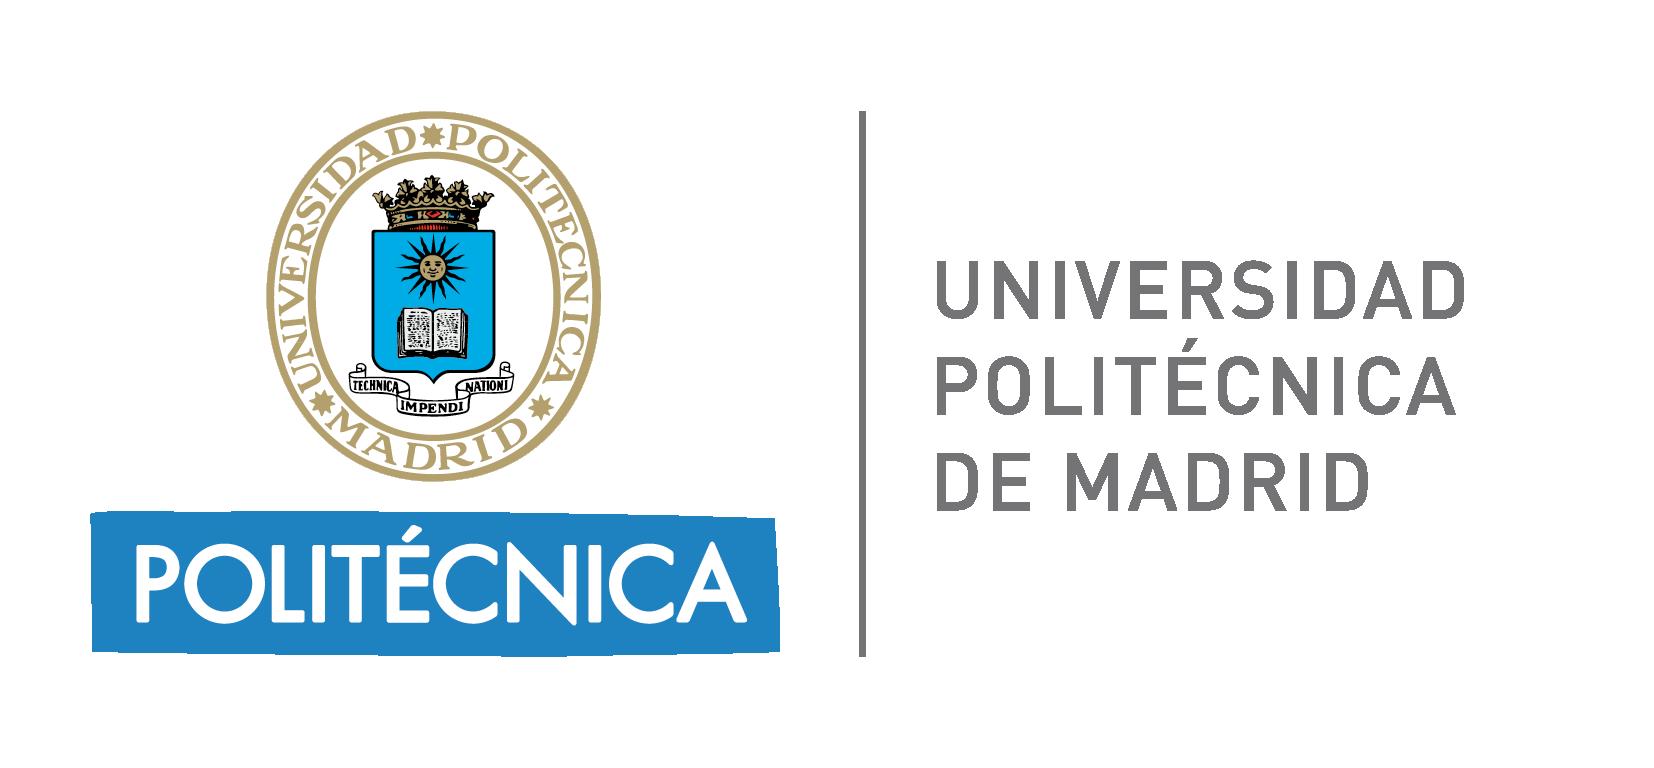 Logo of Universidad Politécnica de Madrid (UPM)